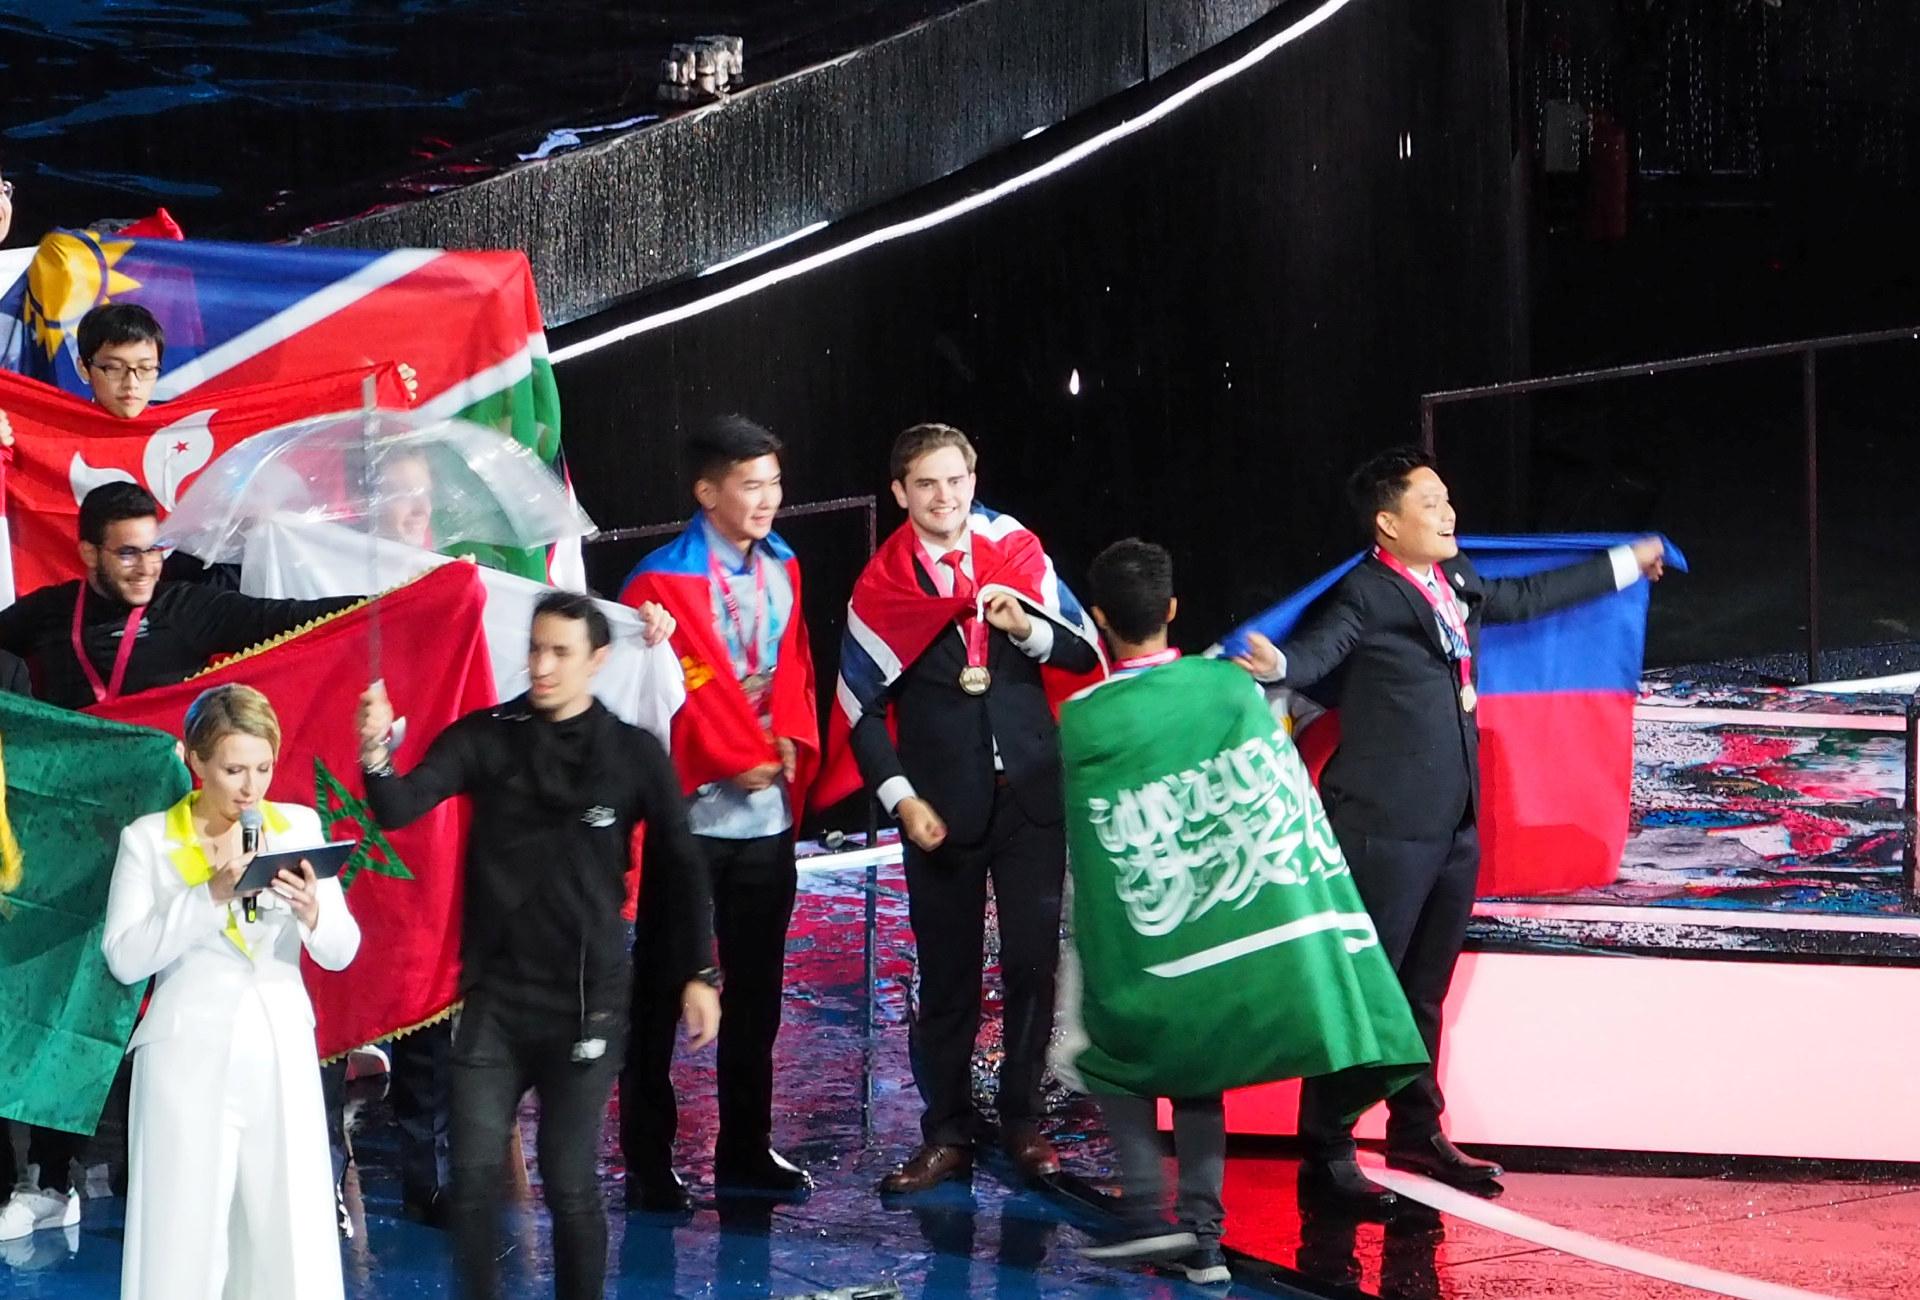 Elektriker Lorang Strand ble Norges Best of Nation under Yrkes-VM 2019 med 720 poeng. Foto: WorldSkills Norway